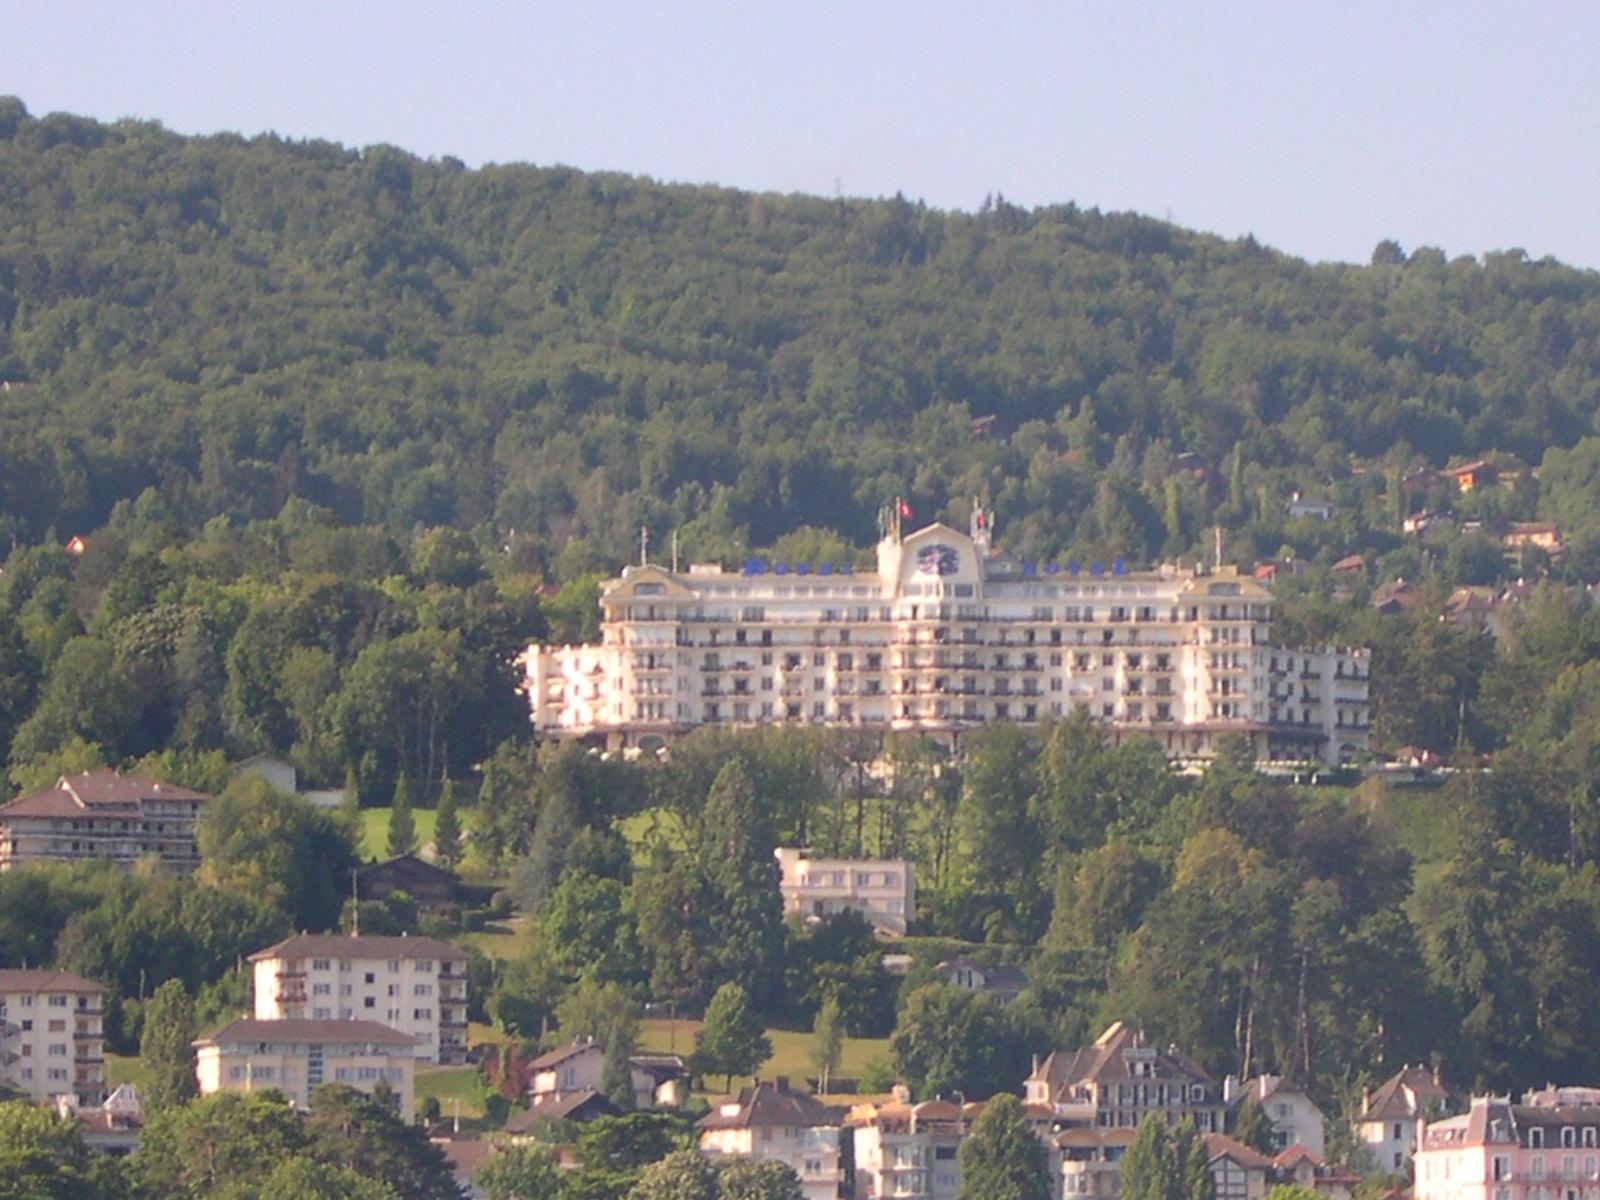 Vian les bains wikipedia - Hotel royal evian les bains ...